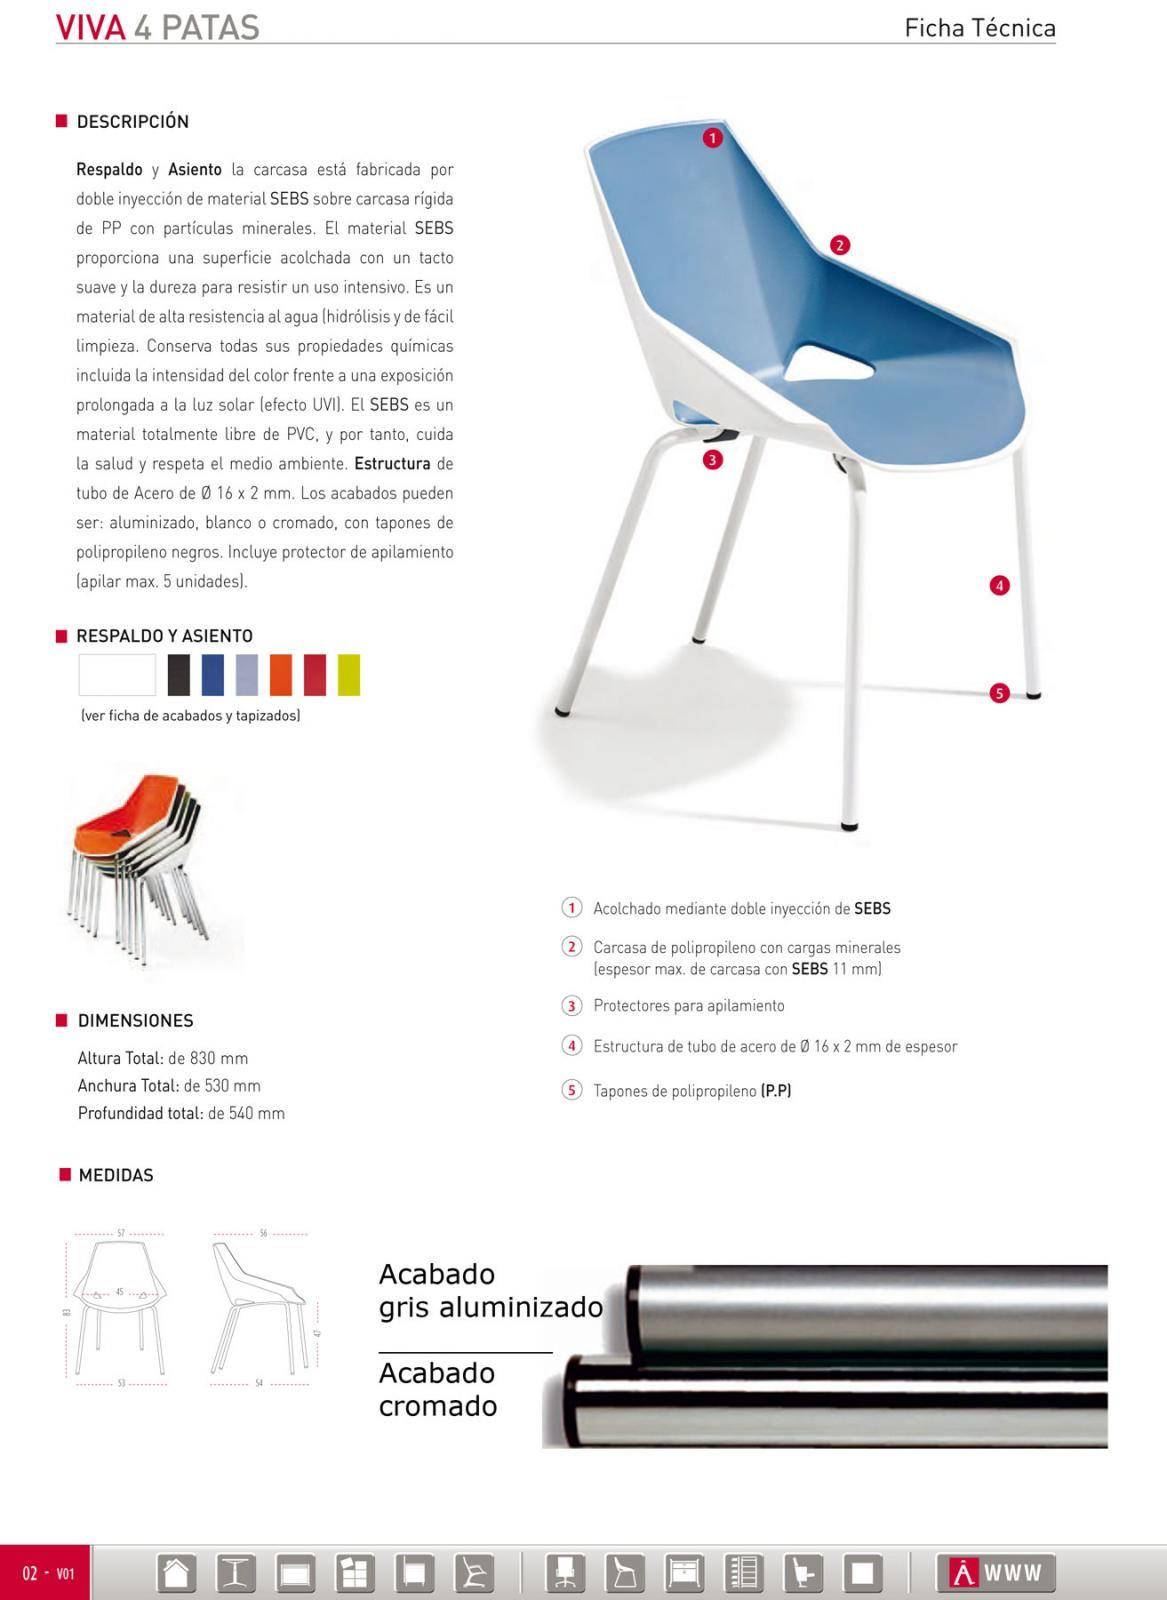 Muebles Ficha Tecnica - Pack De 4 Silla De Dise O Ber Vivaazulnegro Precios Comprar Pack [mjhdah]http://www.ruedasnegocios.com/286/Imagesclient/ficha16917.jpg